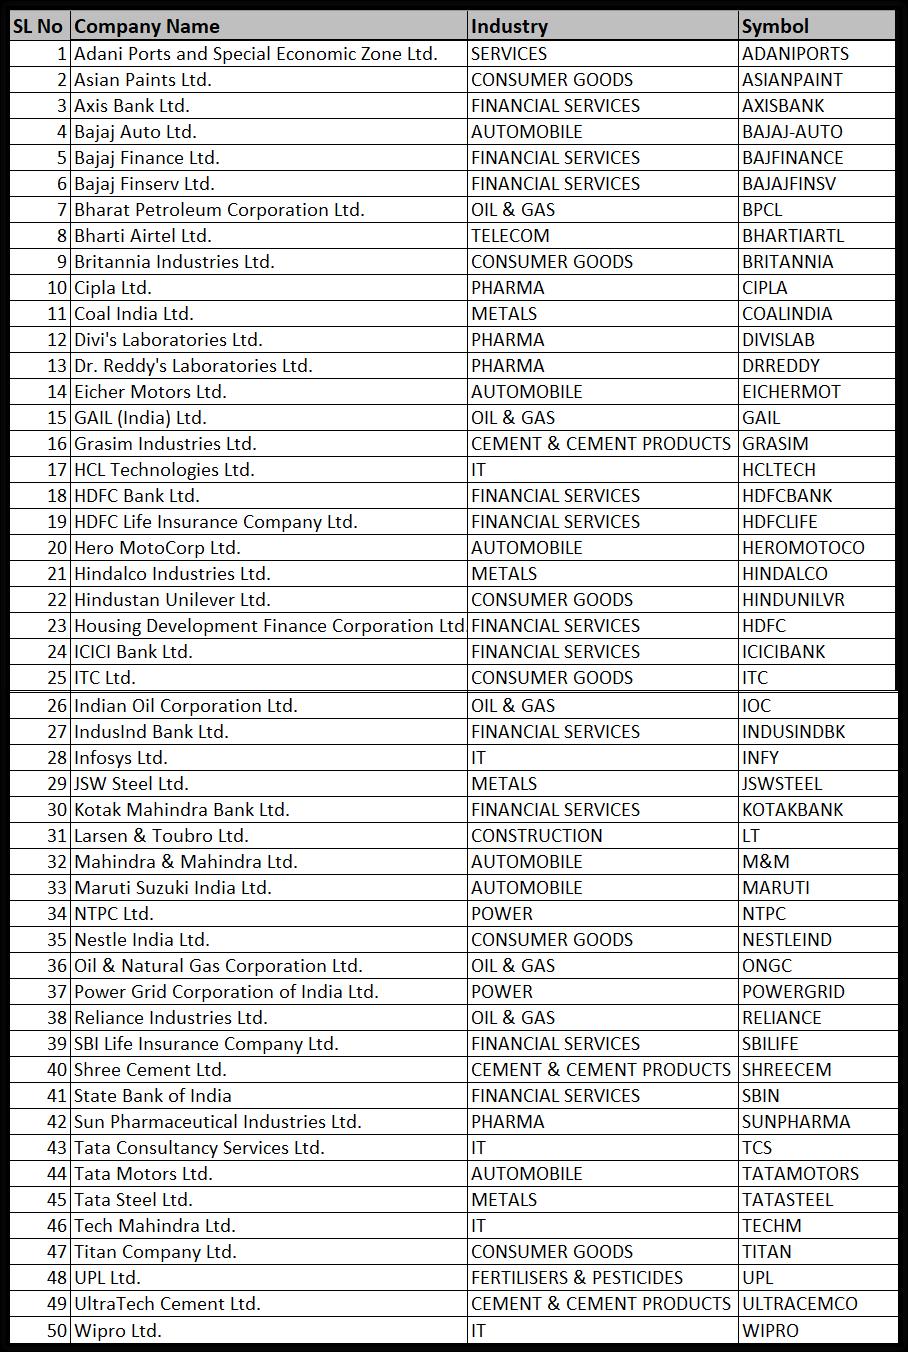 Nifty 50 stocks list - Profiletraders.in